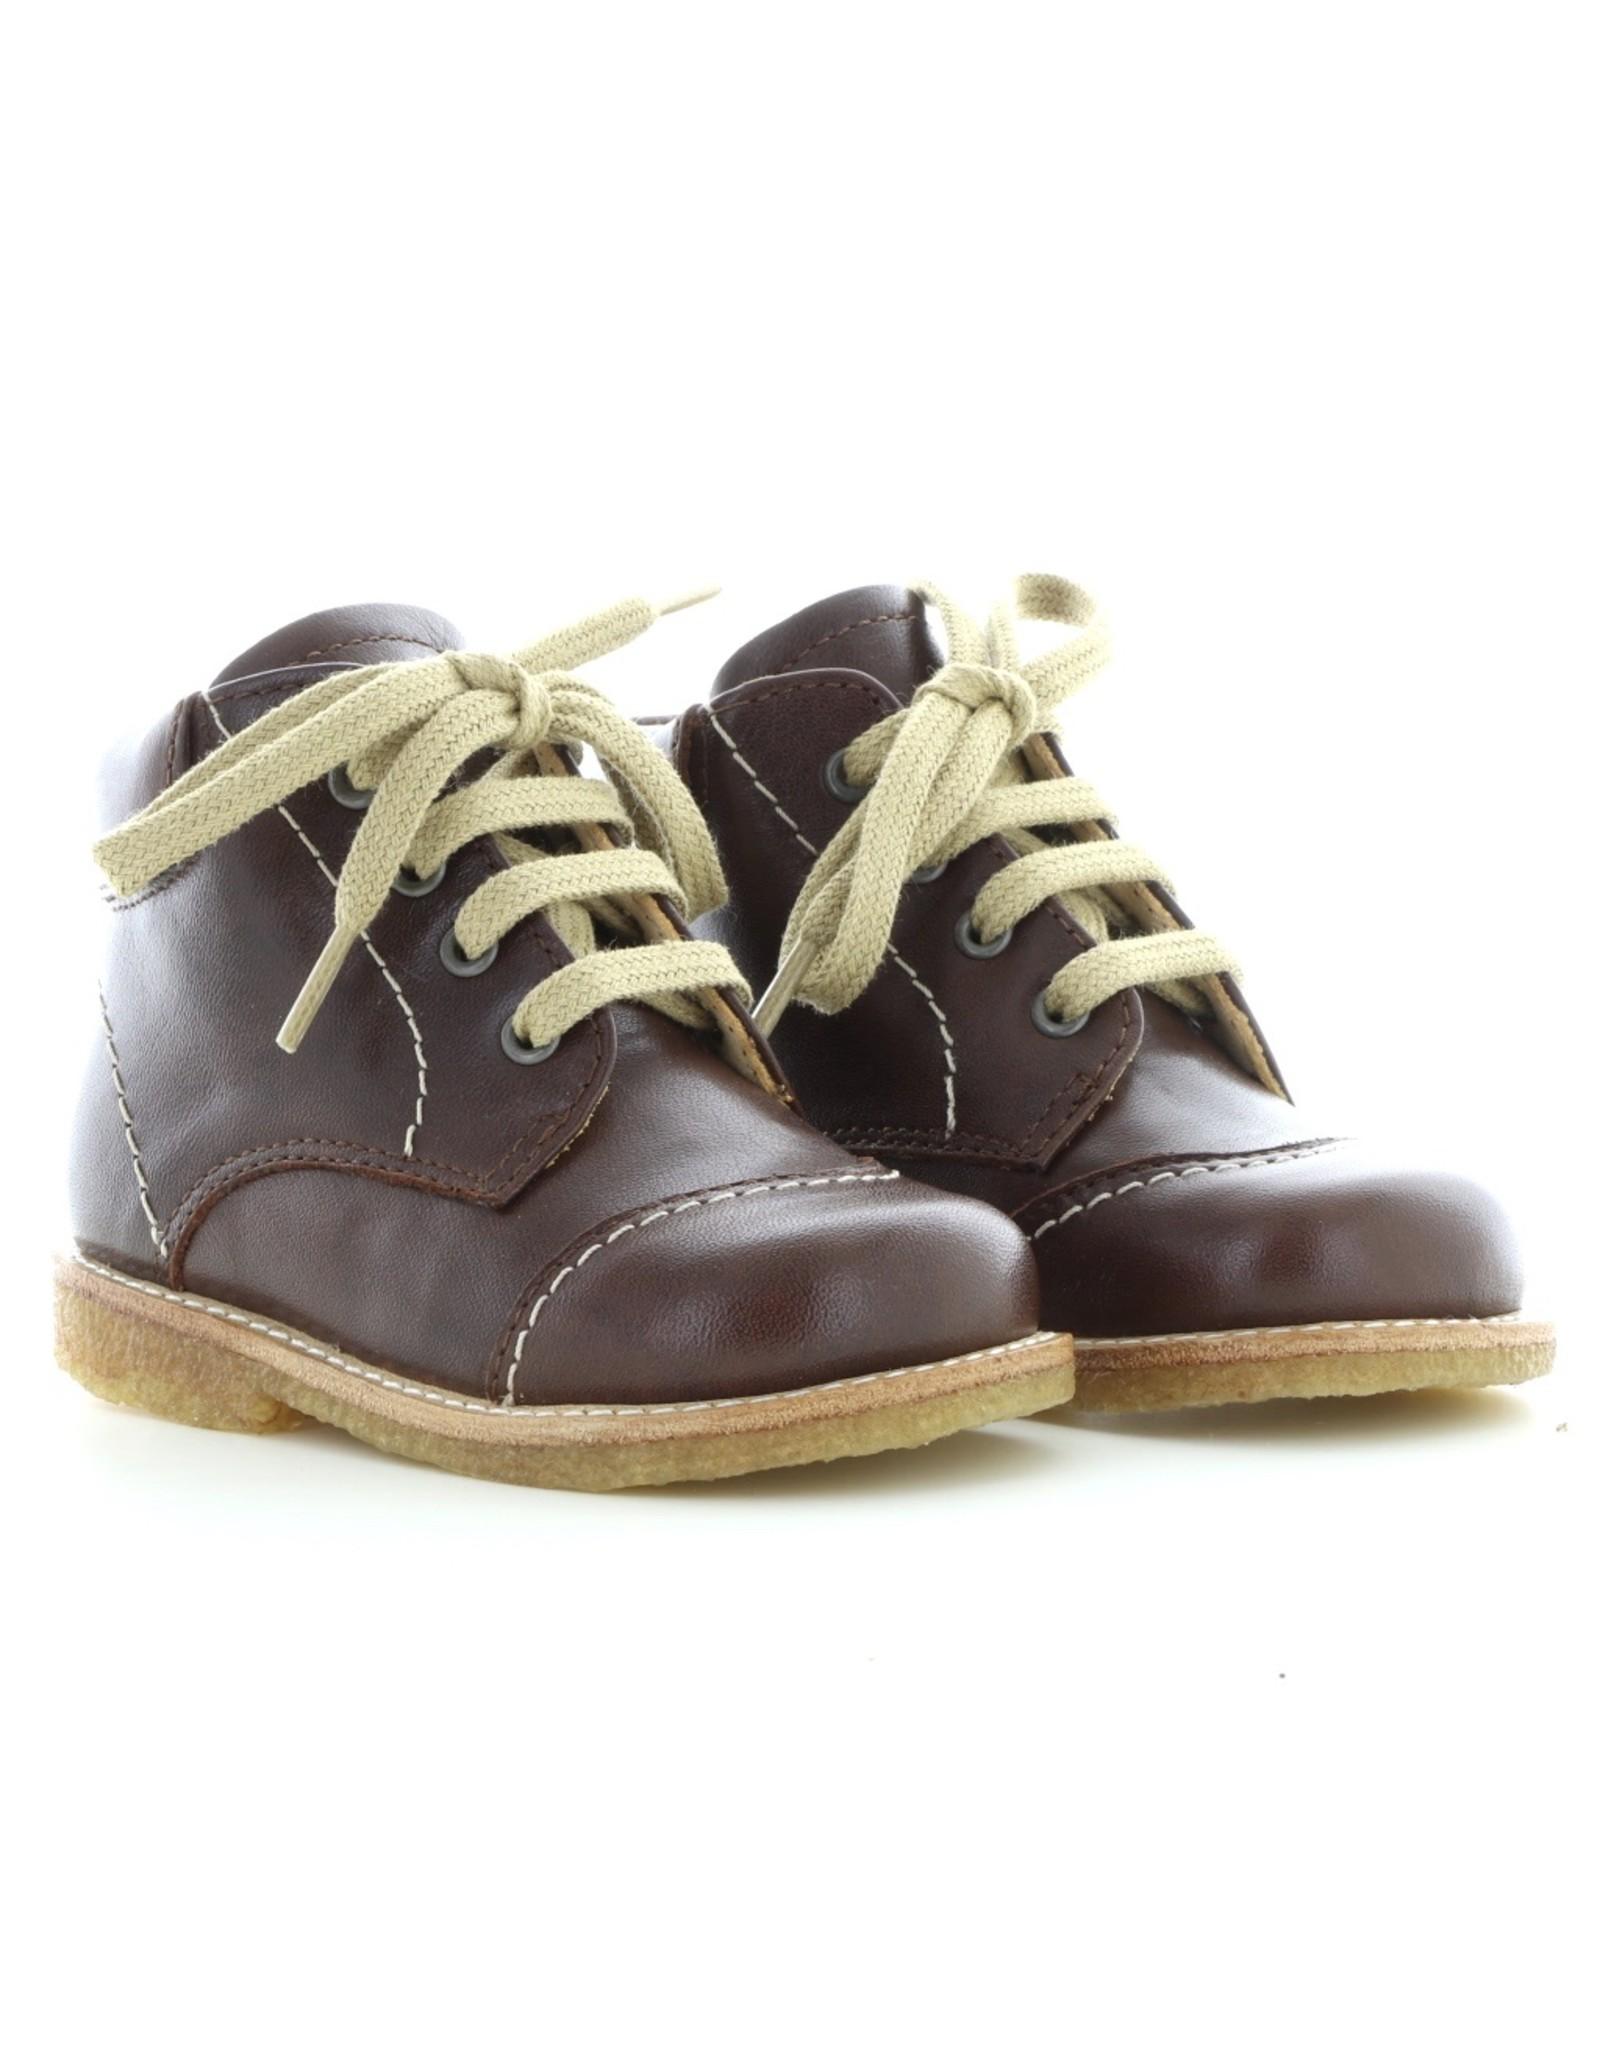 Angulus 2281 brown